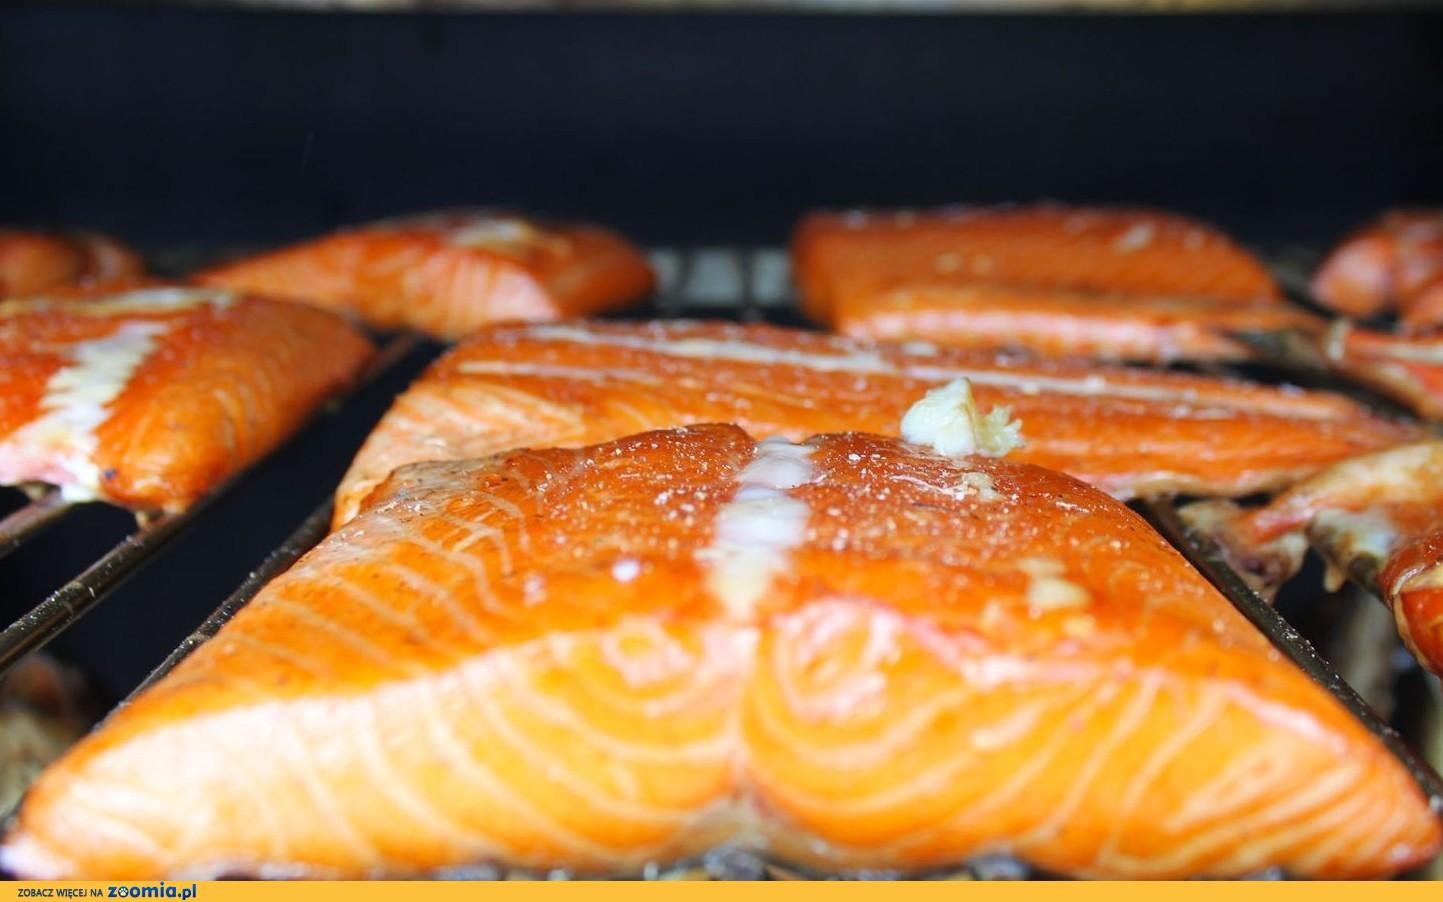 Ryby wędzone - Stół Rybny idealny pomysł na wesela, komunie.